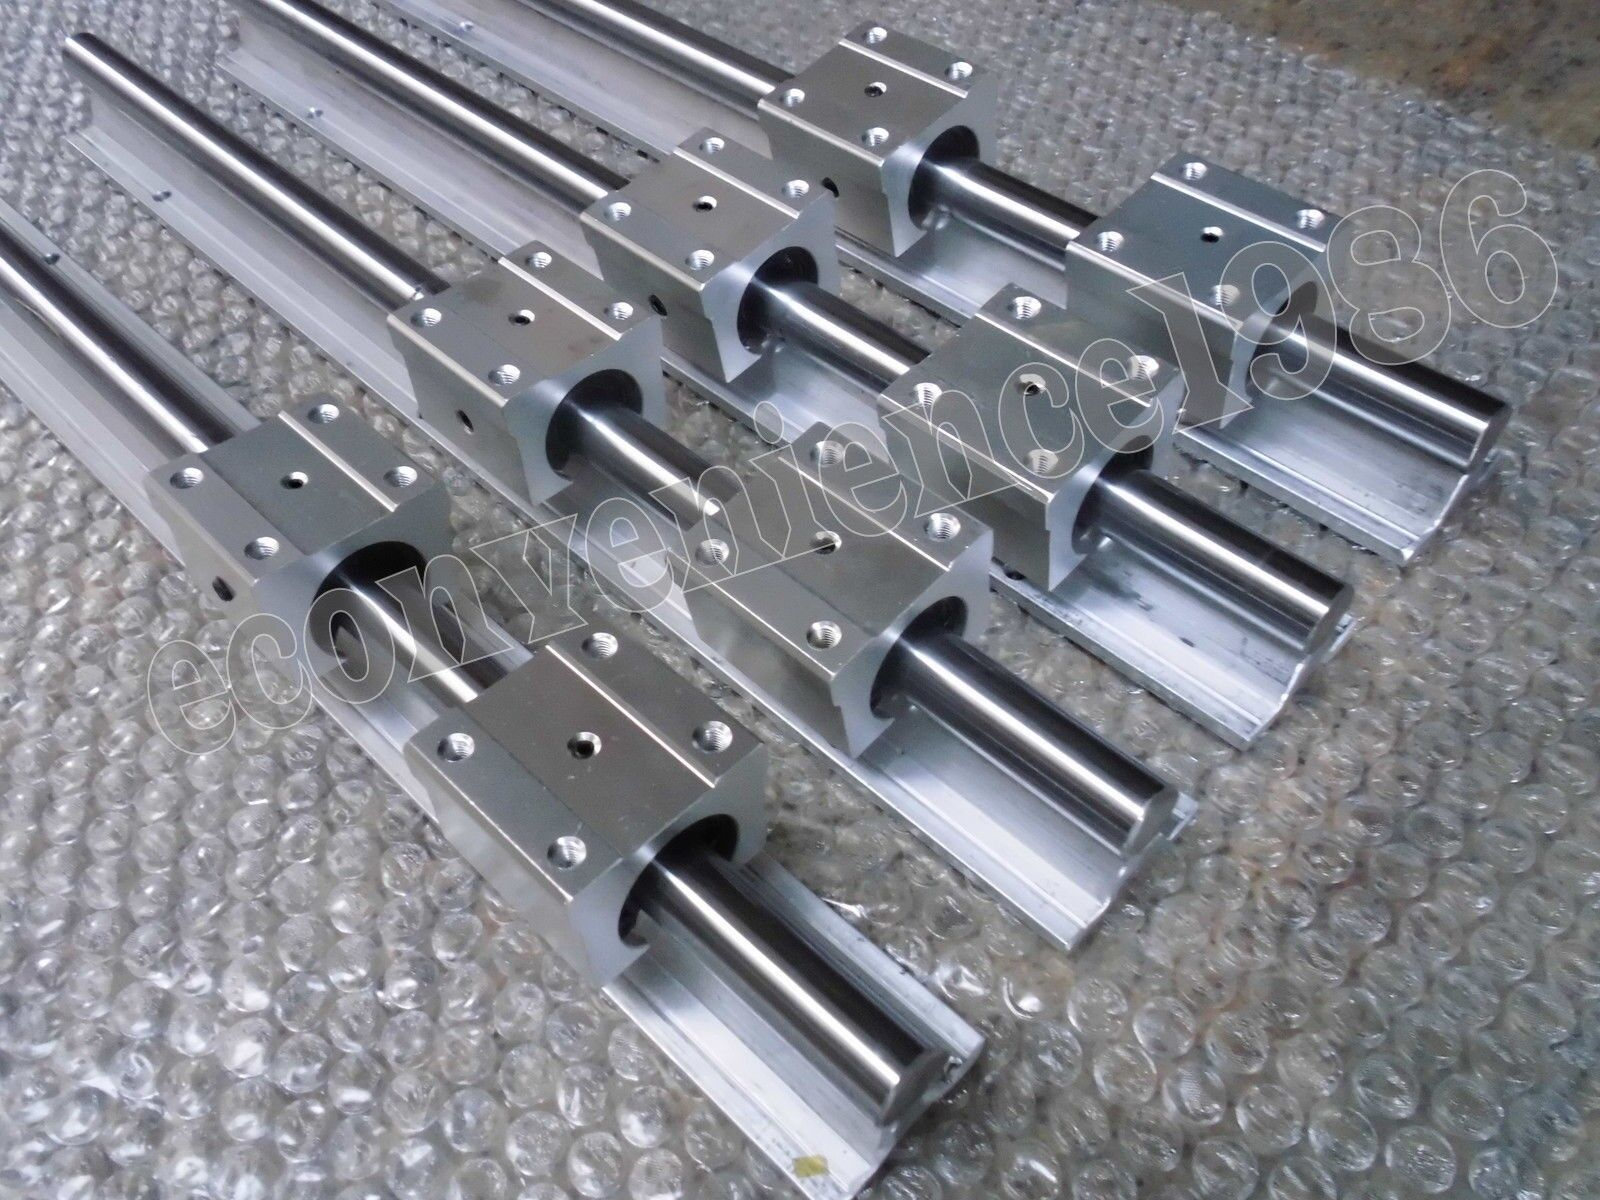 2 x HSR30CA-2R-790 mm Square Liner Rail /& 4 HSR30CA Blcok Bearing